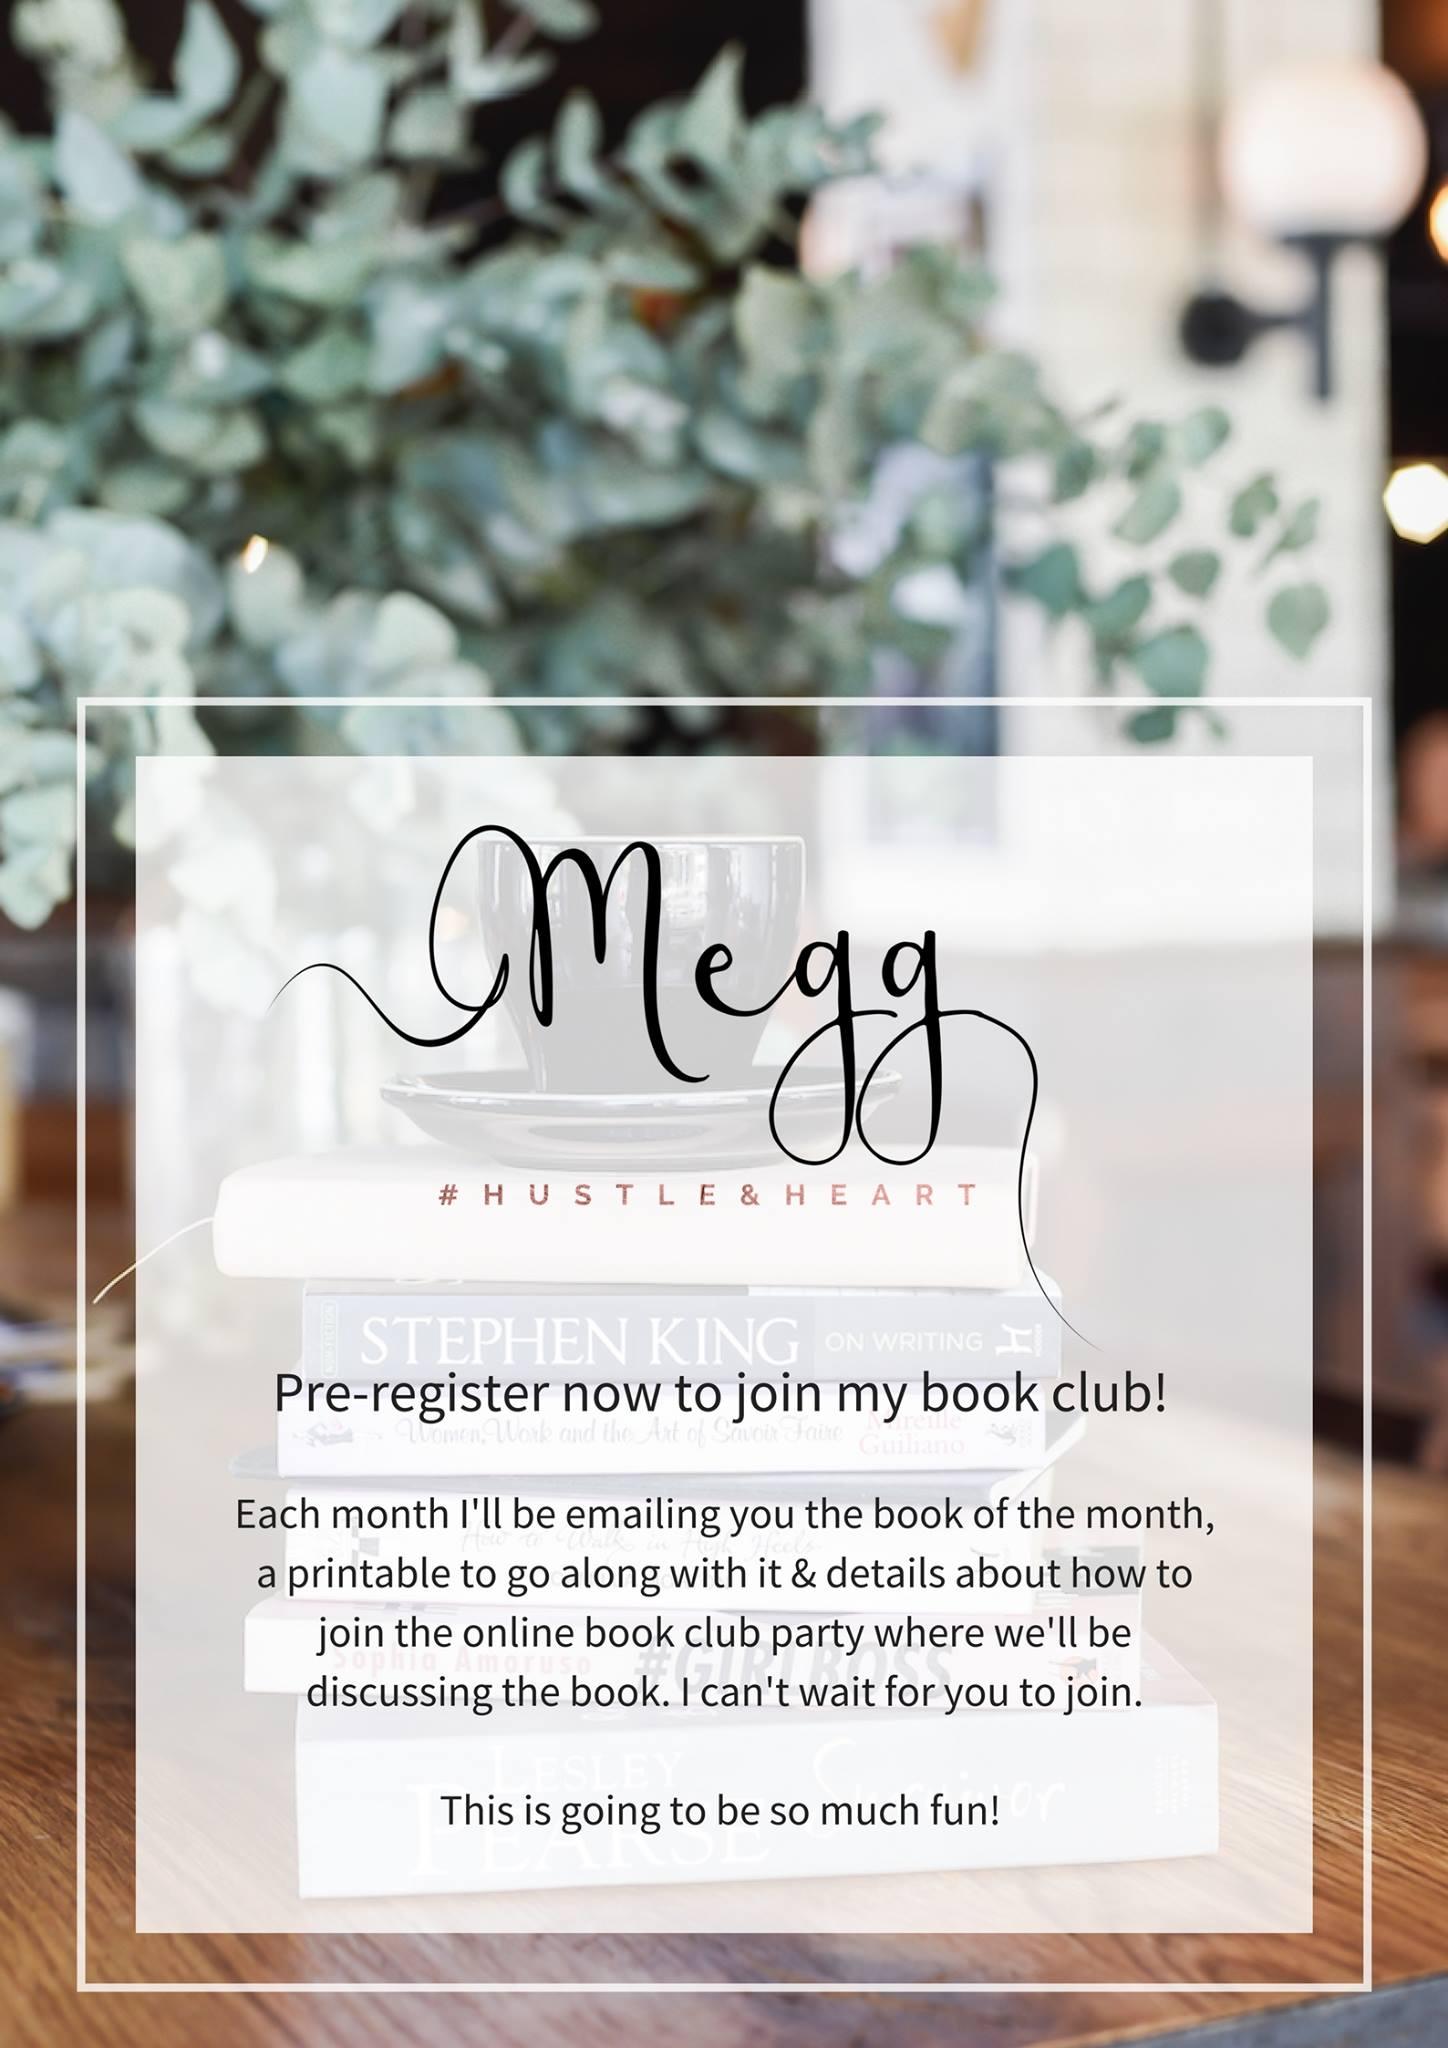 megg geri online book club